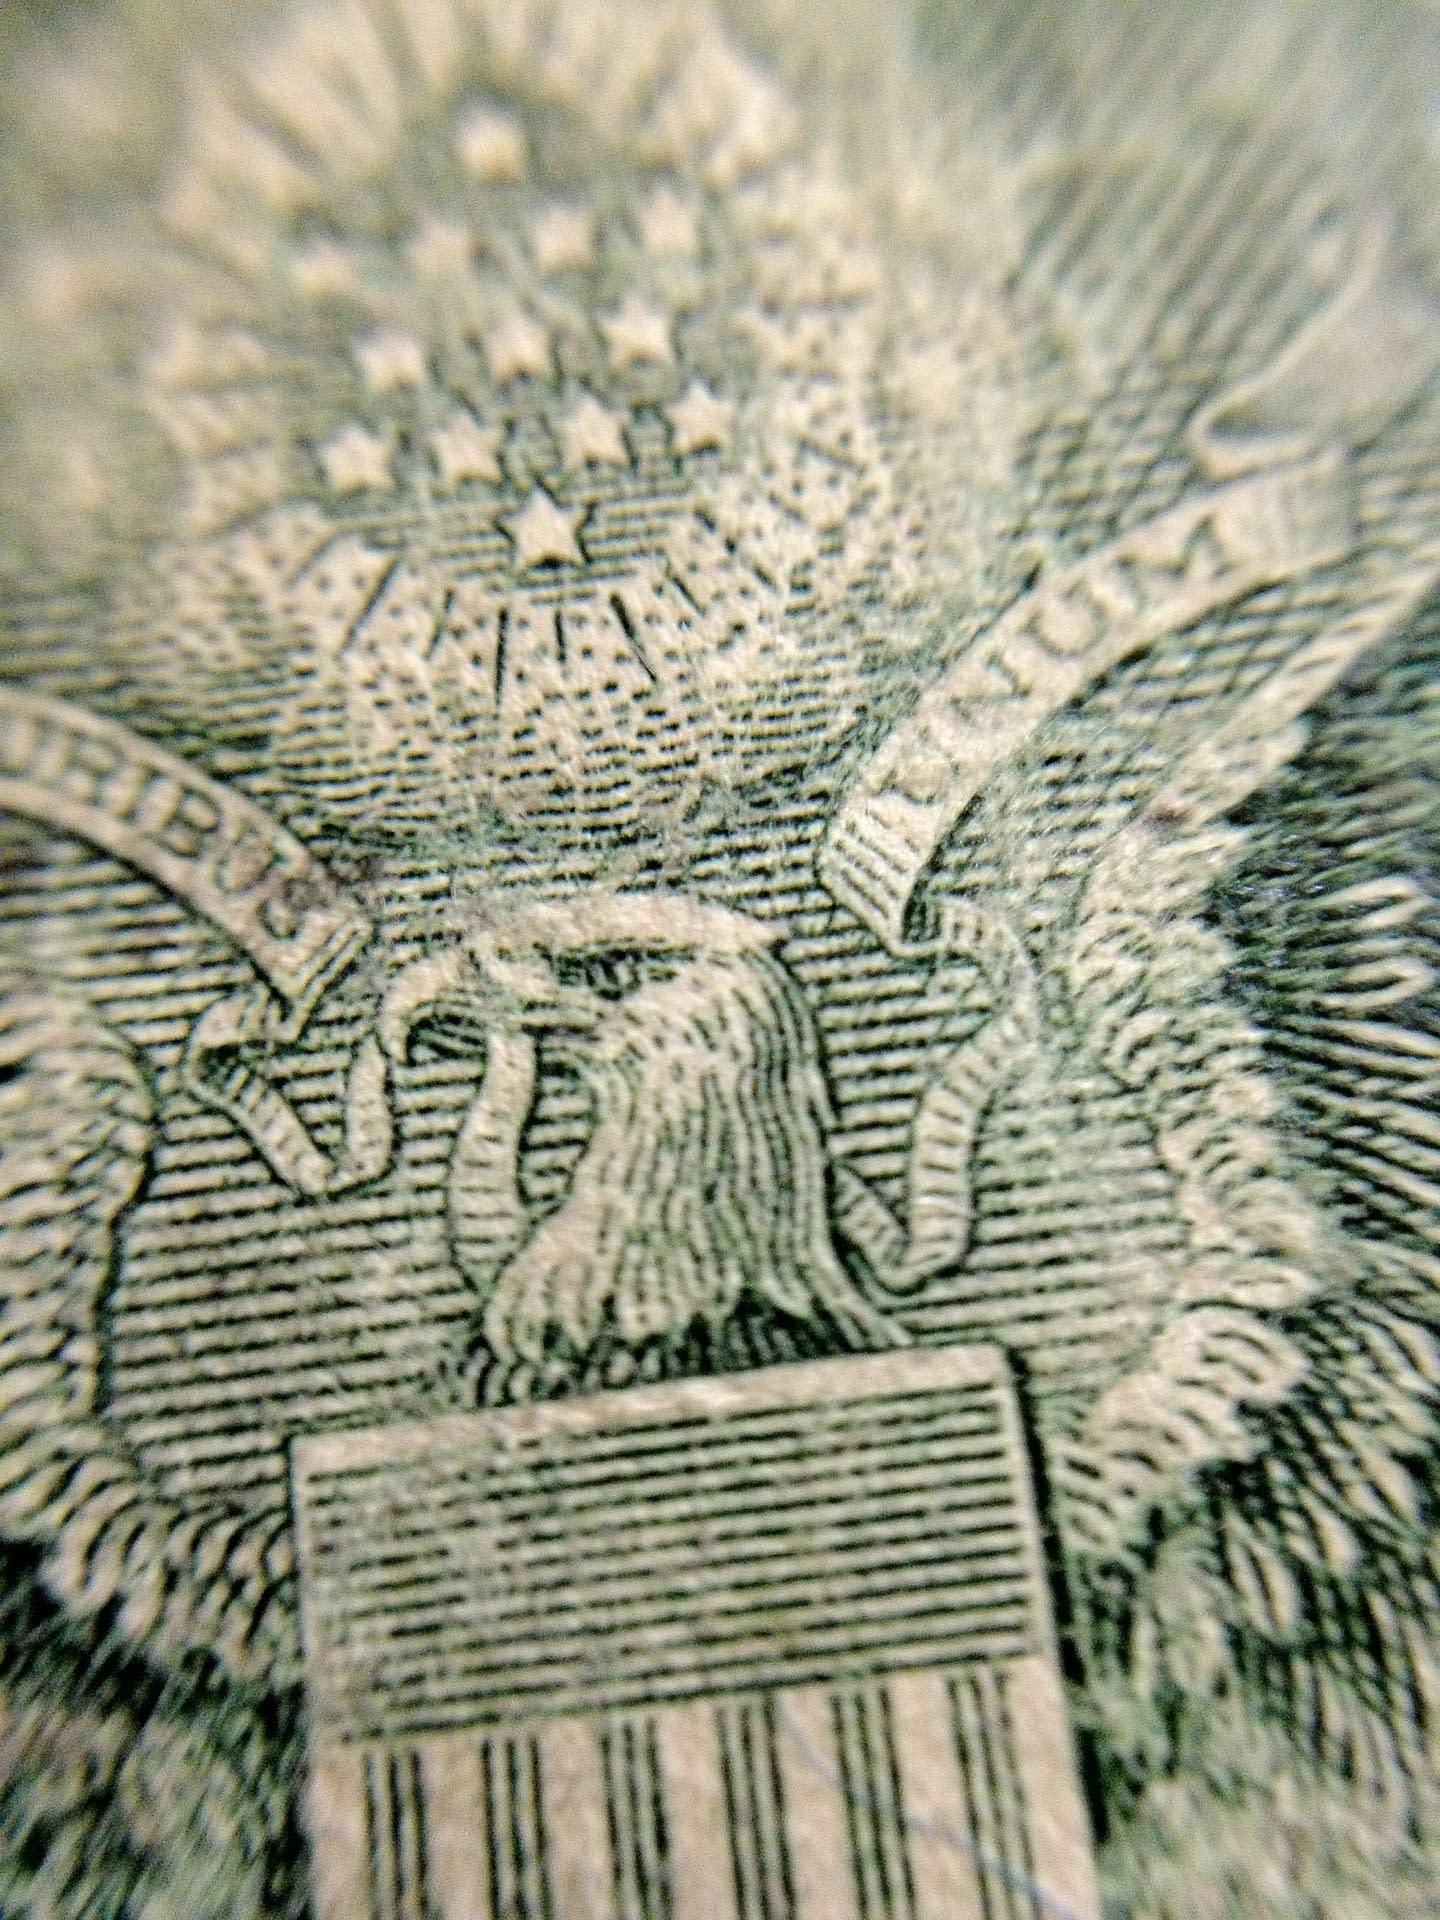 $2 Bill Macro Eagle